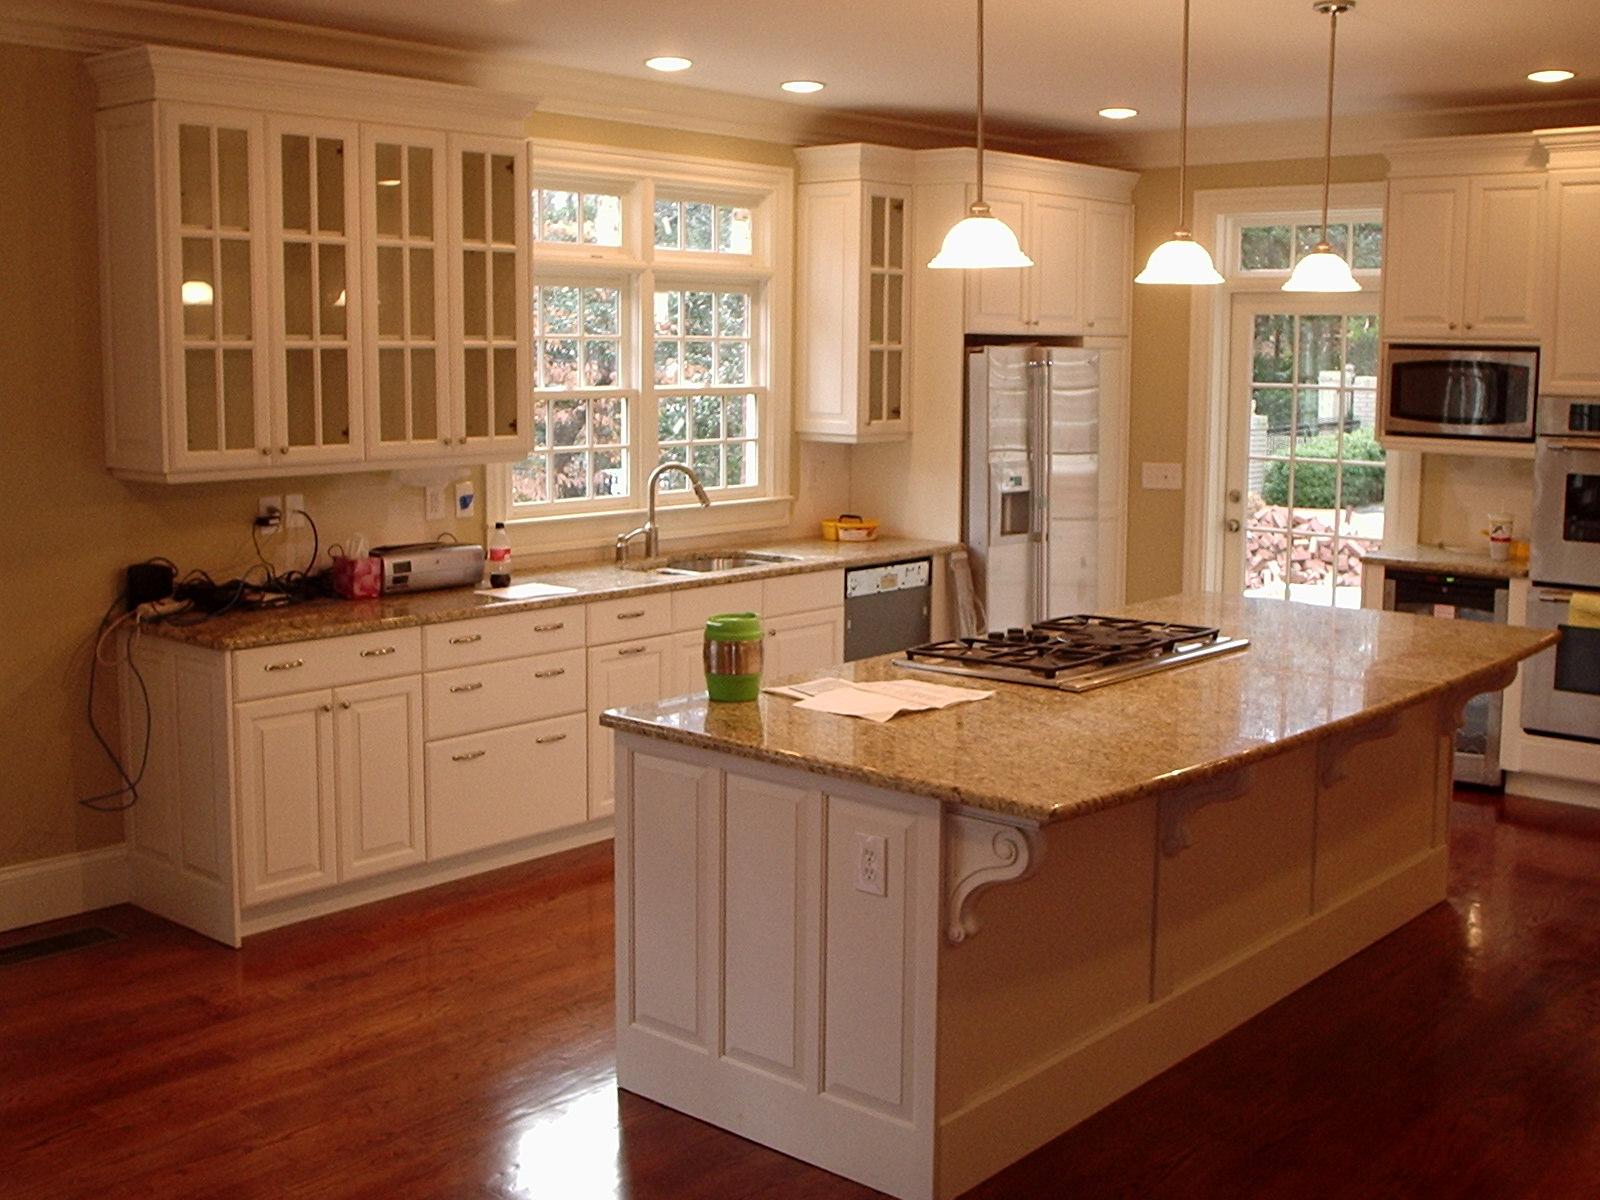 Kitchen cabinets shelves photo - 3